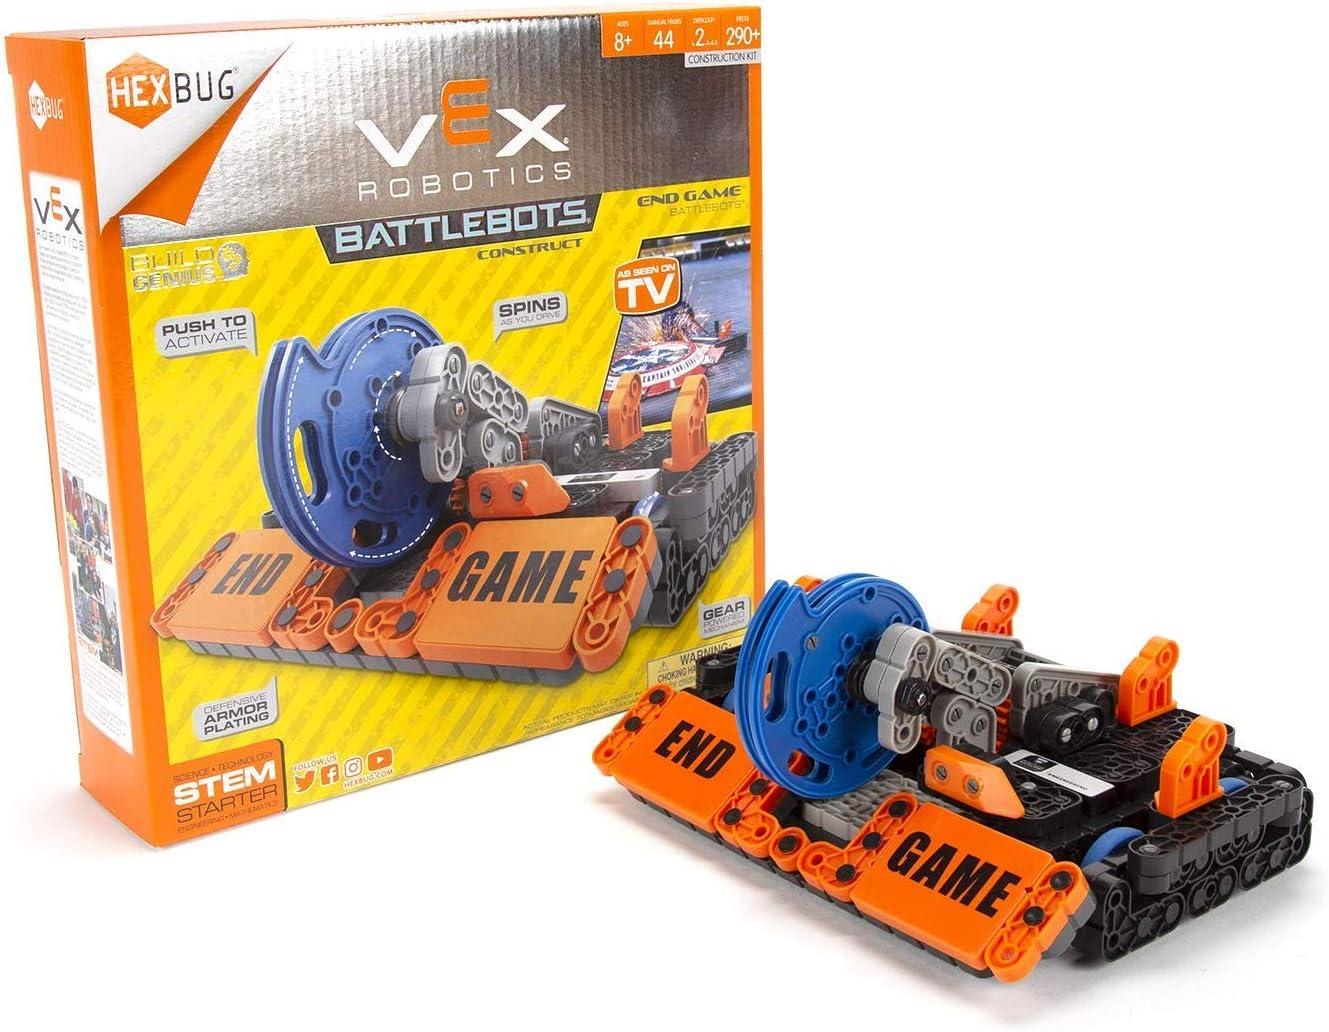 HEXBUG VEX Robotics BattleBots Bite Force Construction Kit